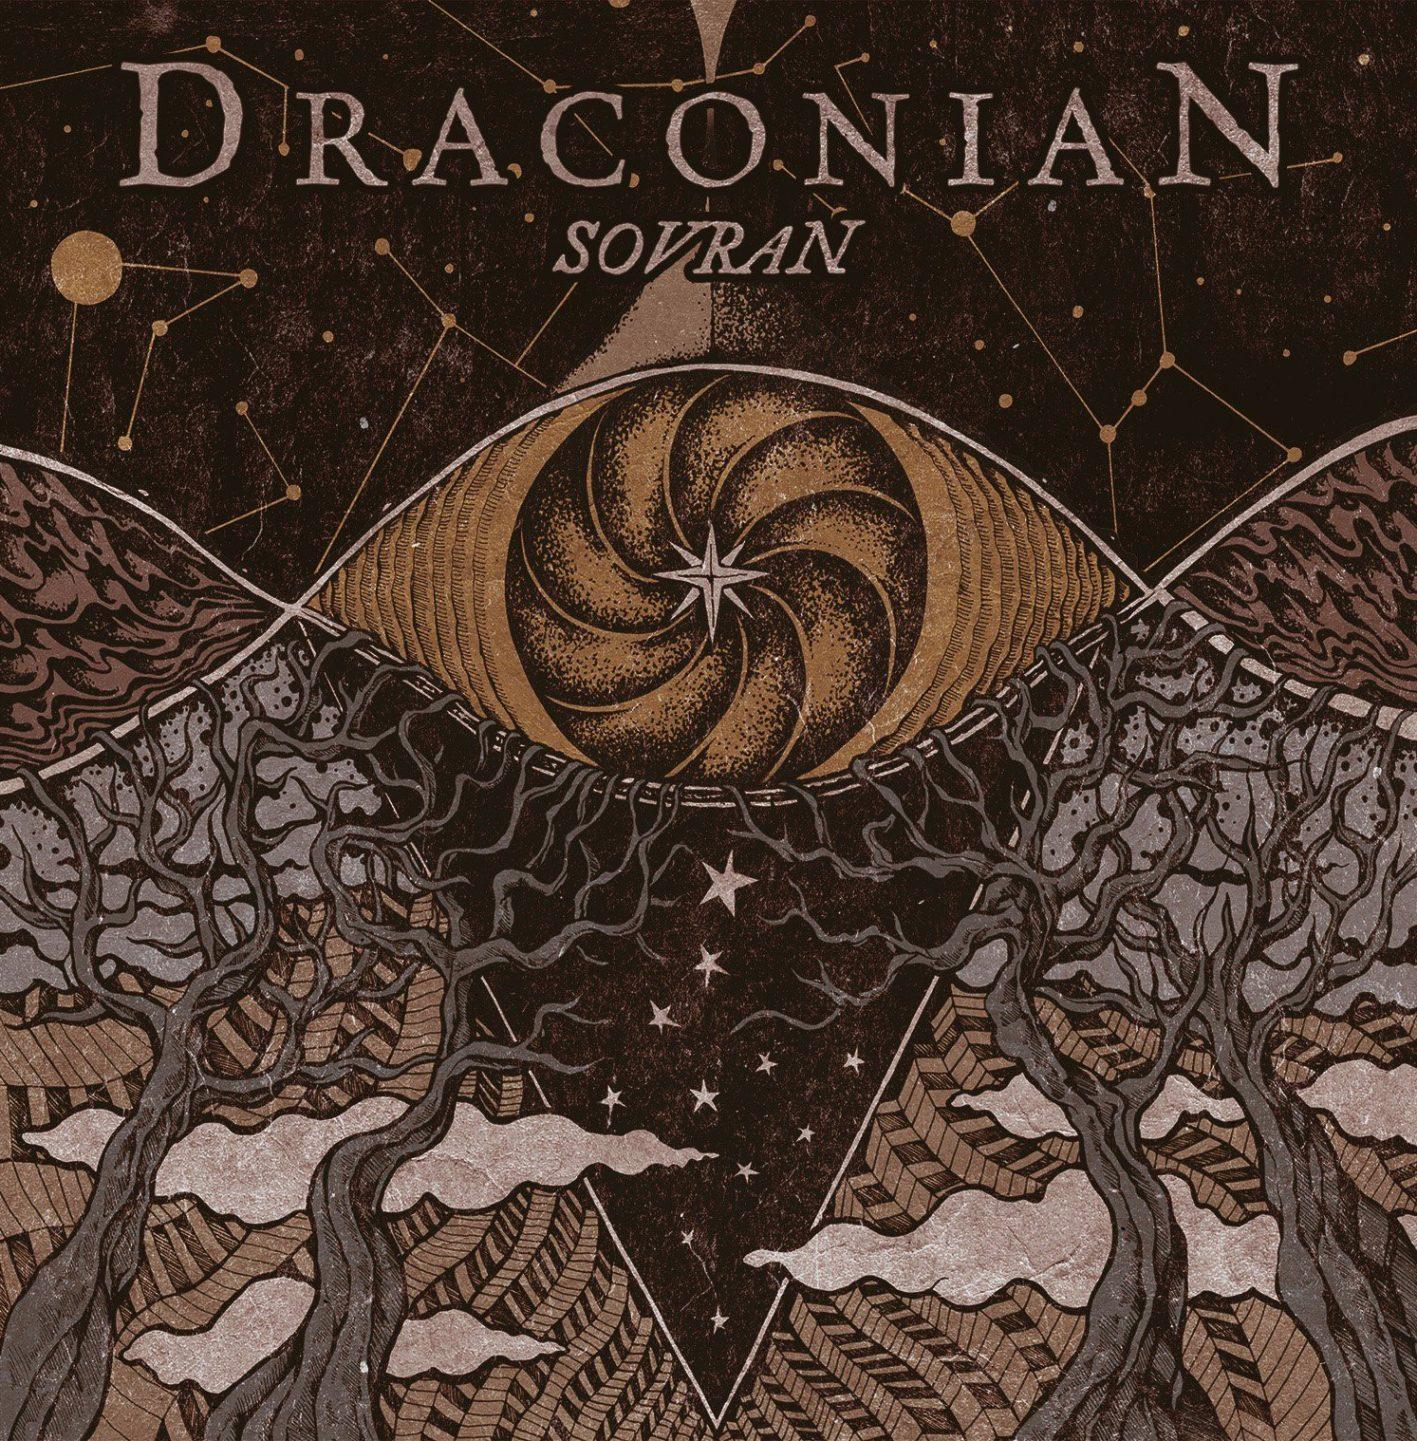 Draconian-Sovran-album-cover